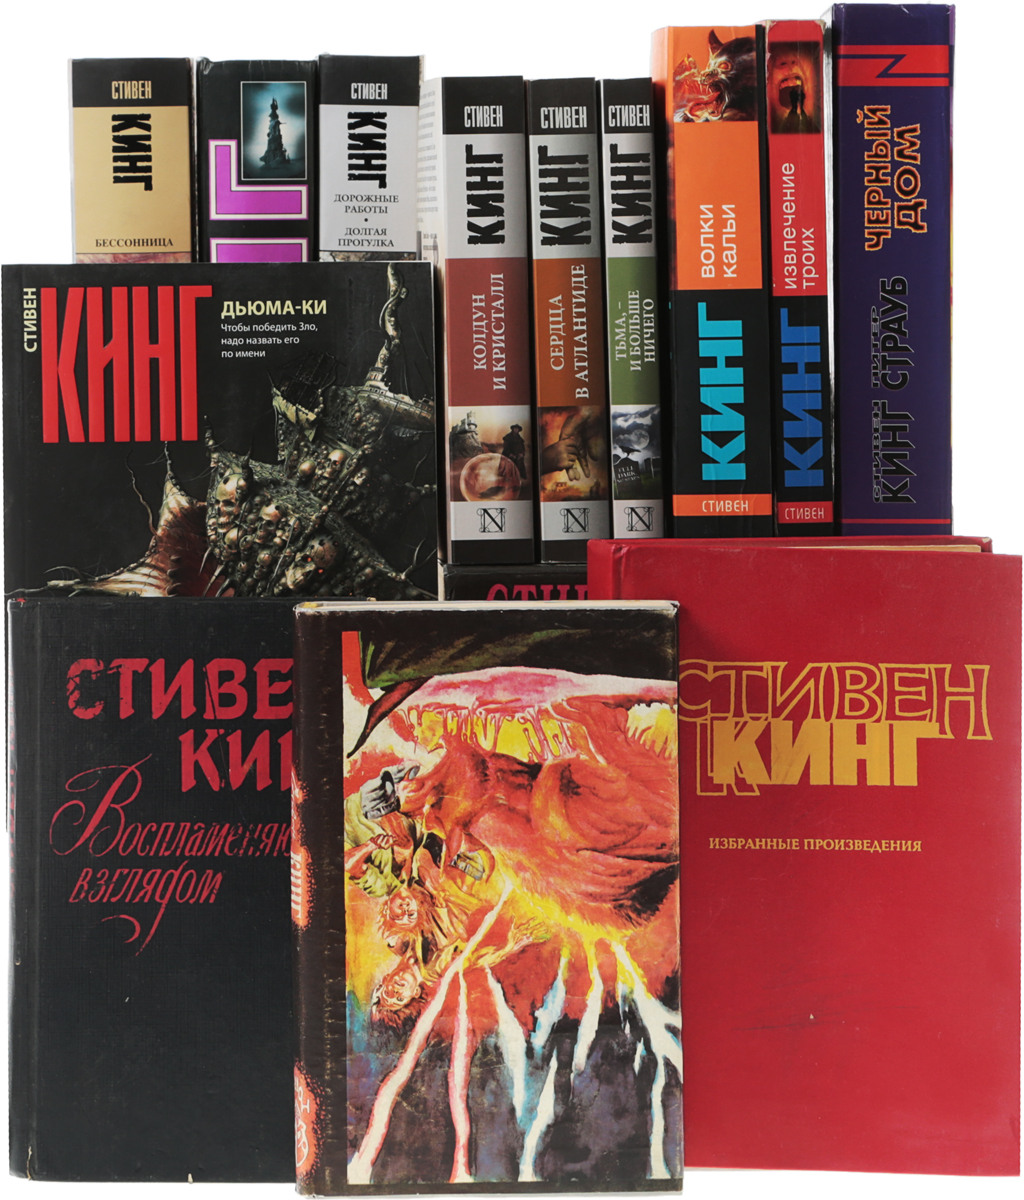 Кинг С. Кинг С. Сочинения (комплект из 15 книг) кинг с талисман